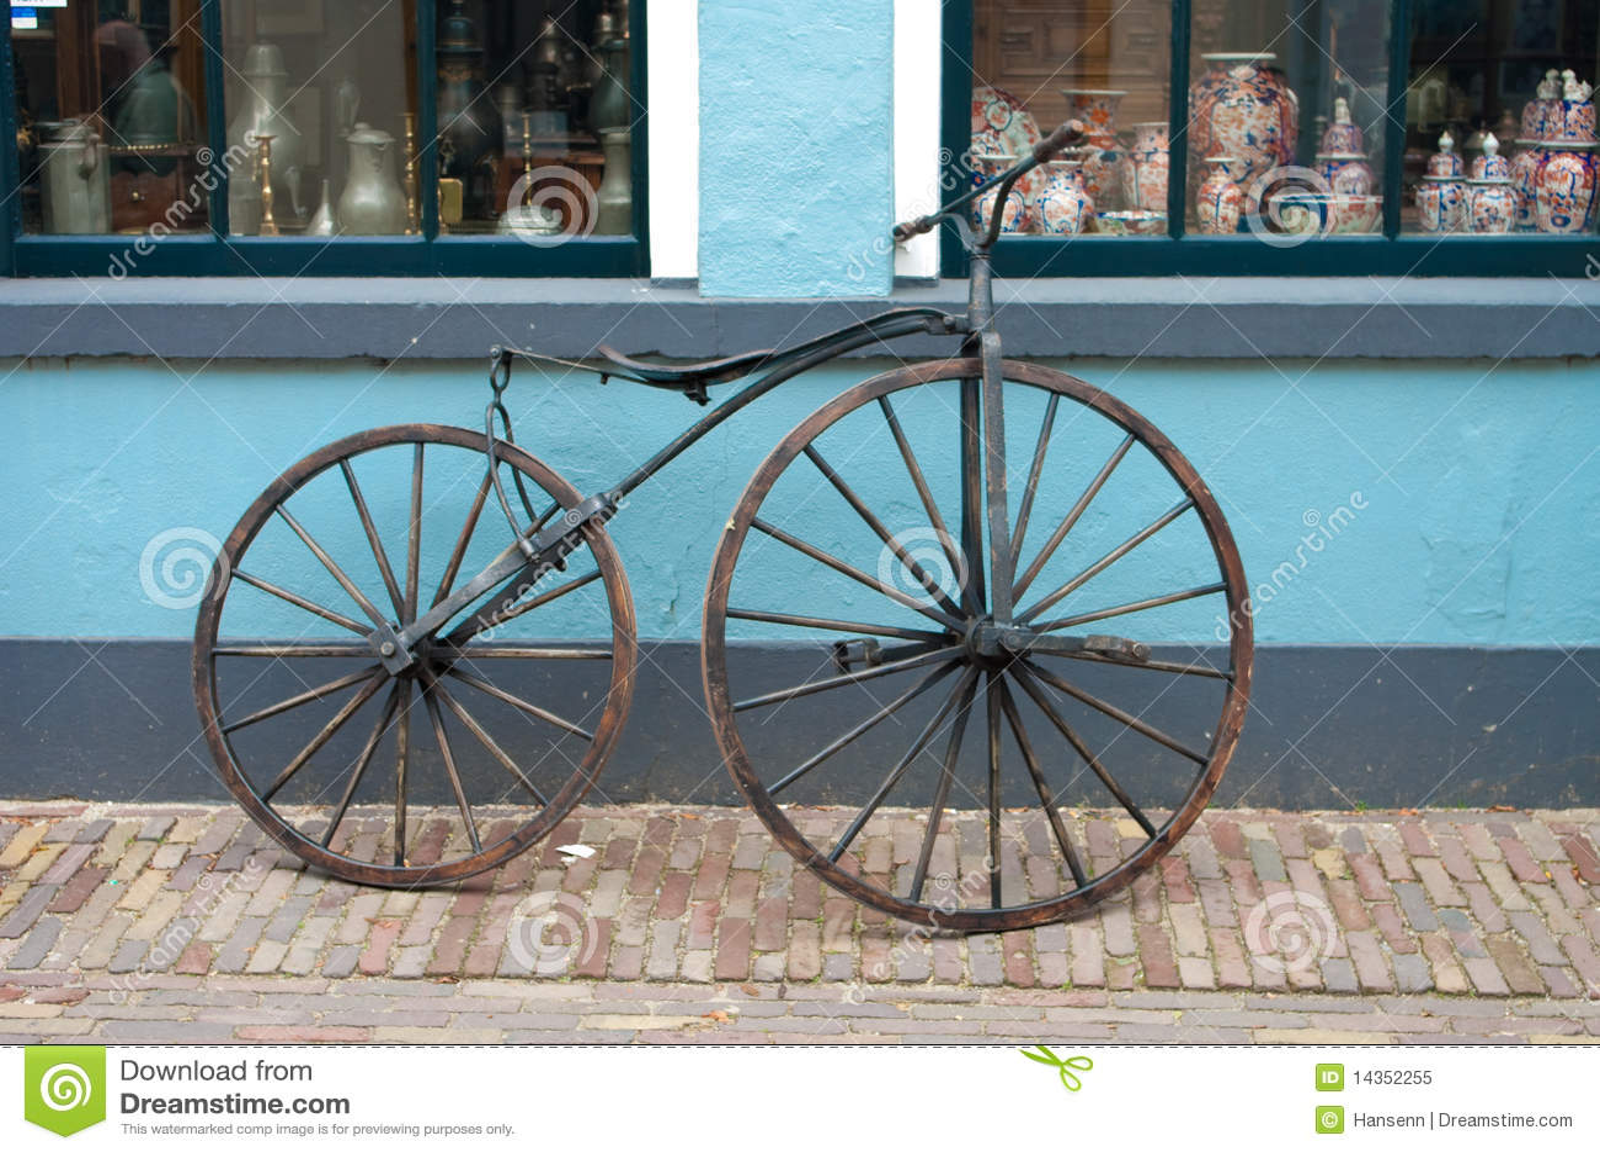 altes fahrrad des 19 jahrhunderts lizenzfreies stockfoto bild 14352255. Black Bedroom Furniture Sets. Home Design Ideas